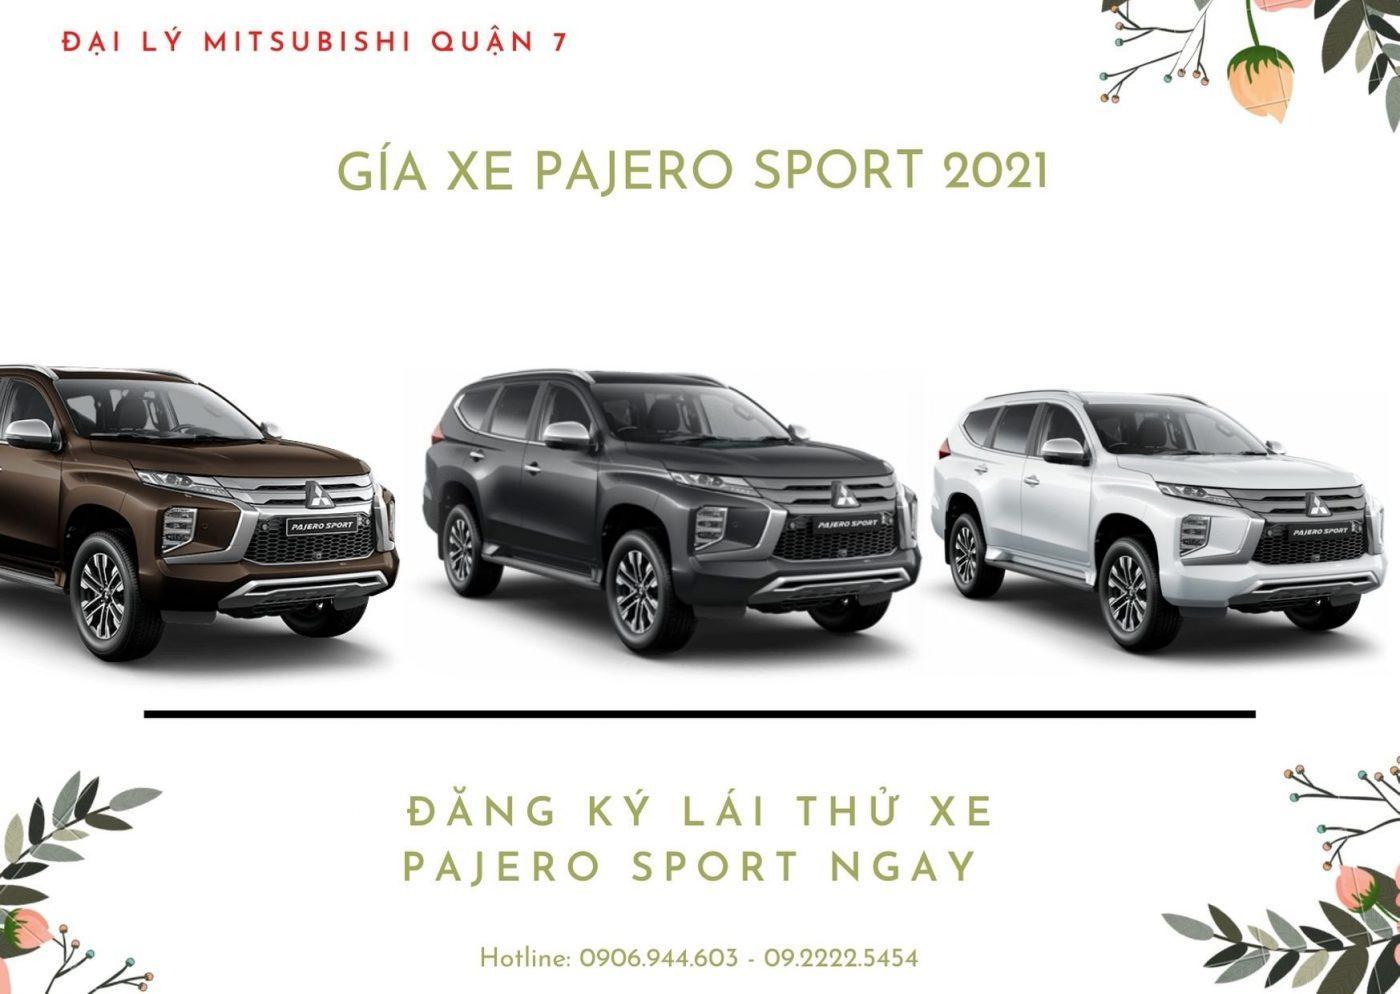 Giá Xe Pajero Sport 2021 – Mua Xe Pajero Sport Giá Tốt